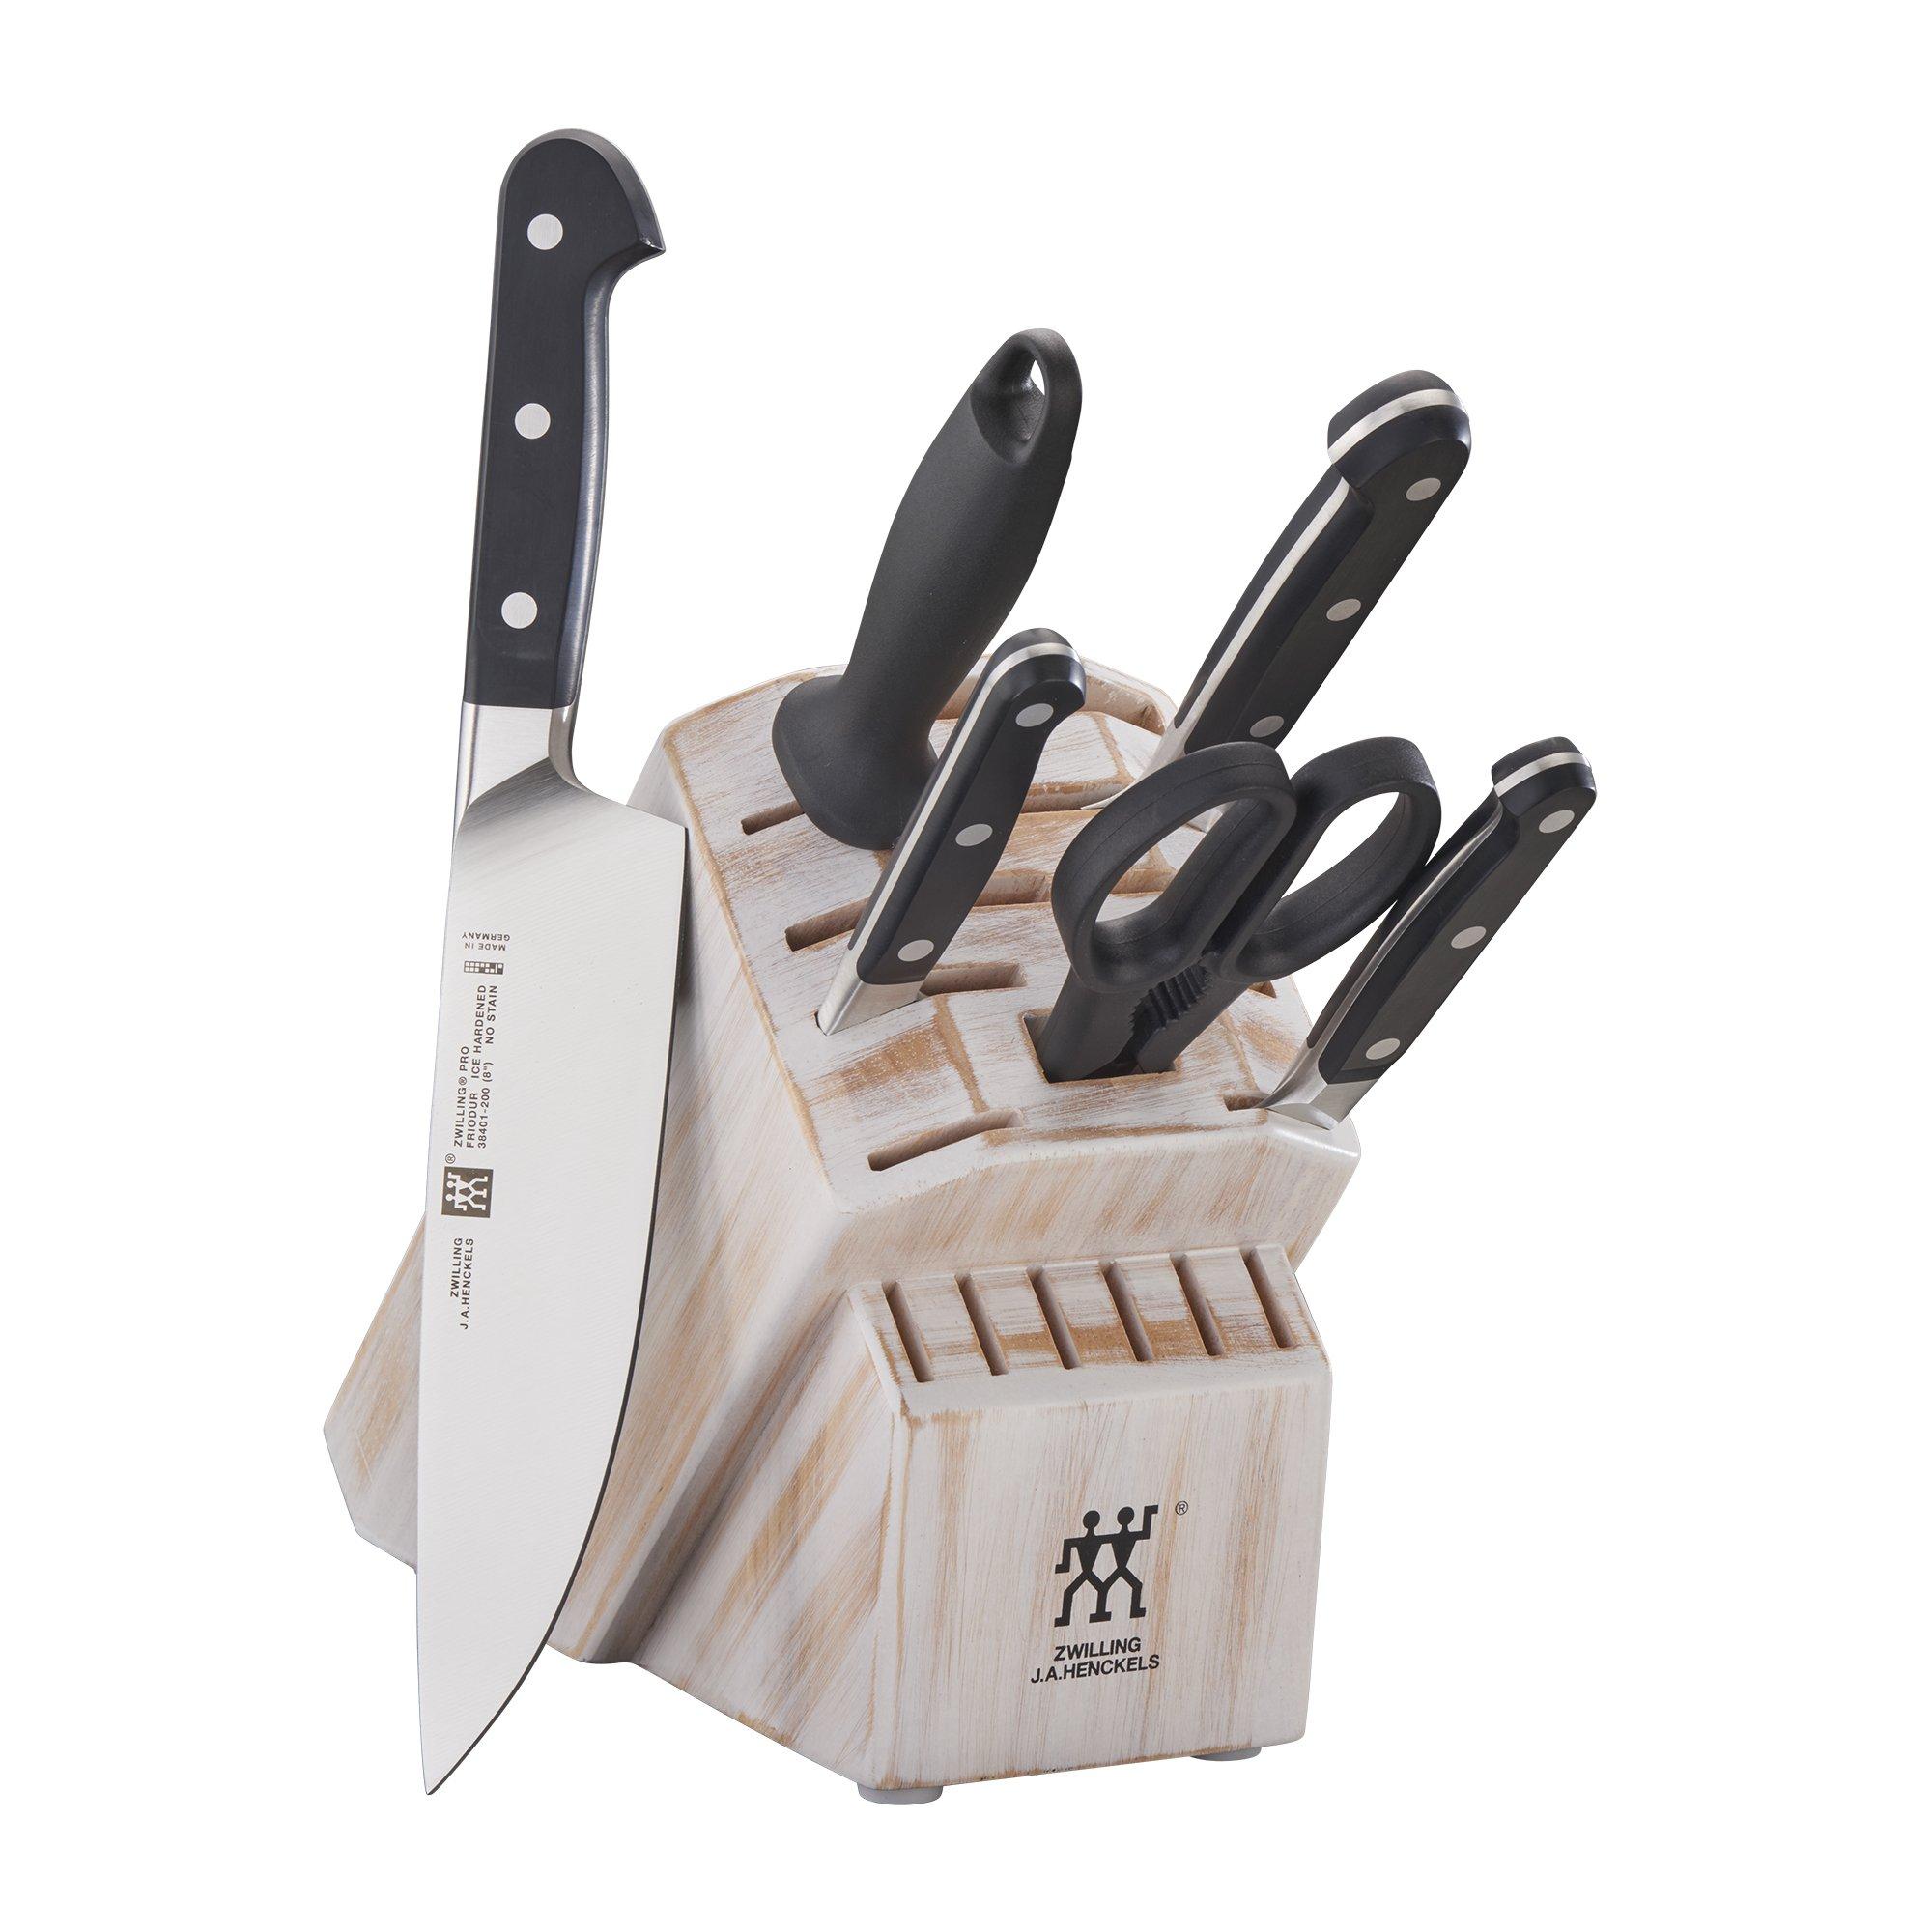 ZWILLING Pro 7-pc Knife Block Set - Rustic White